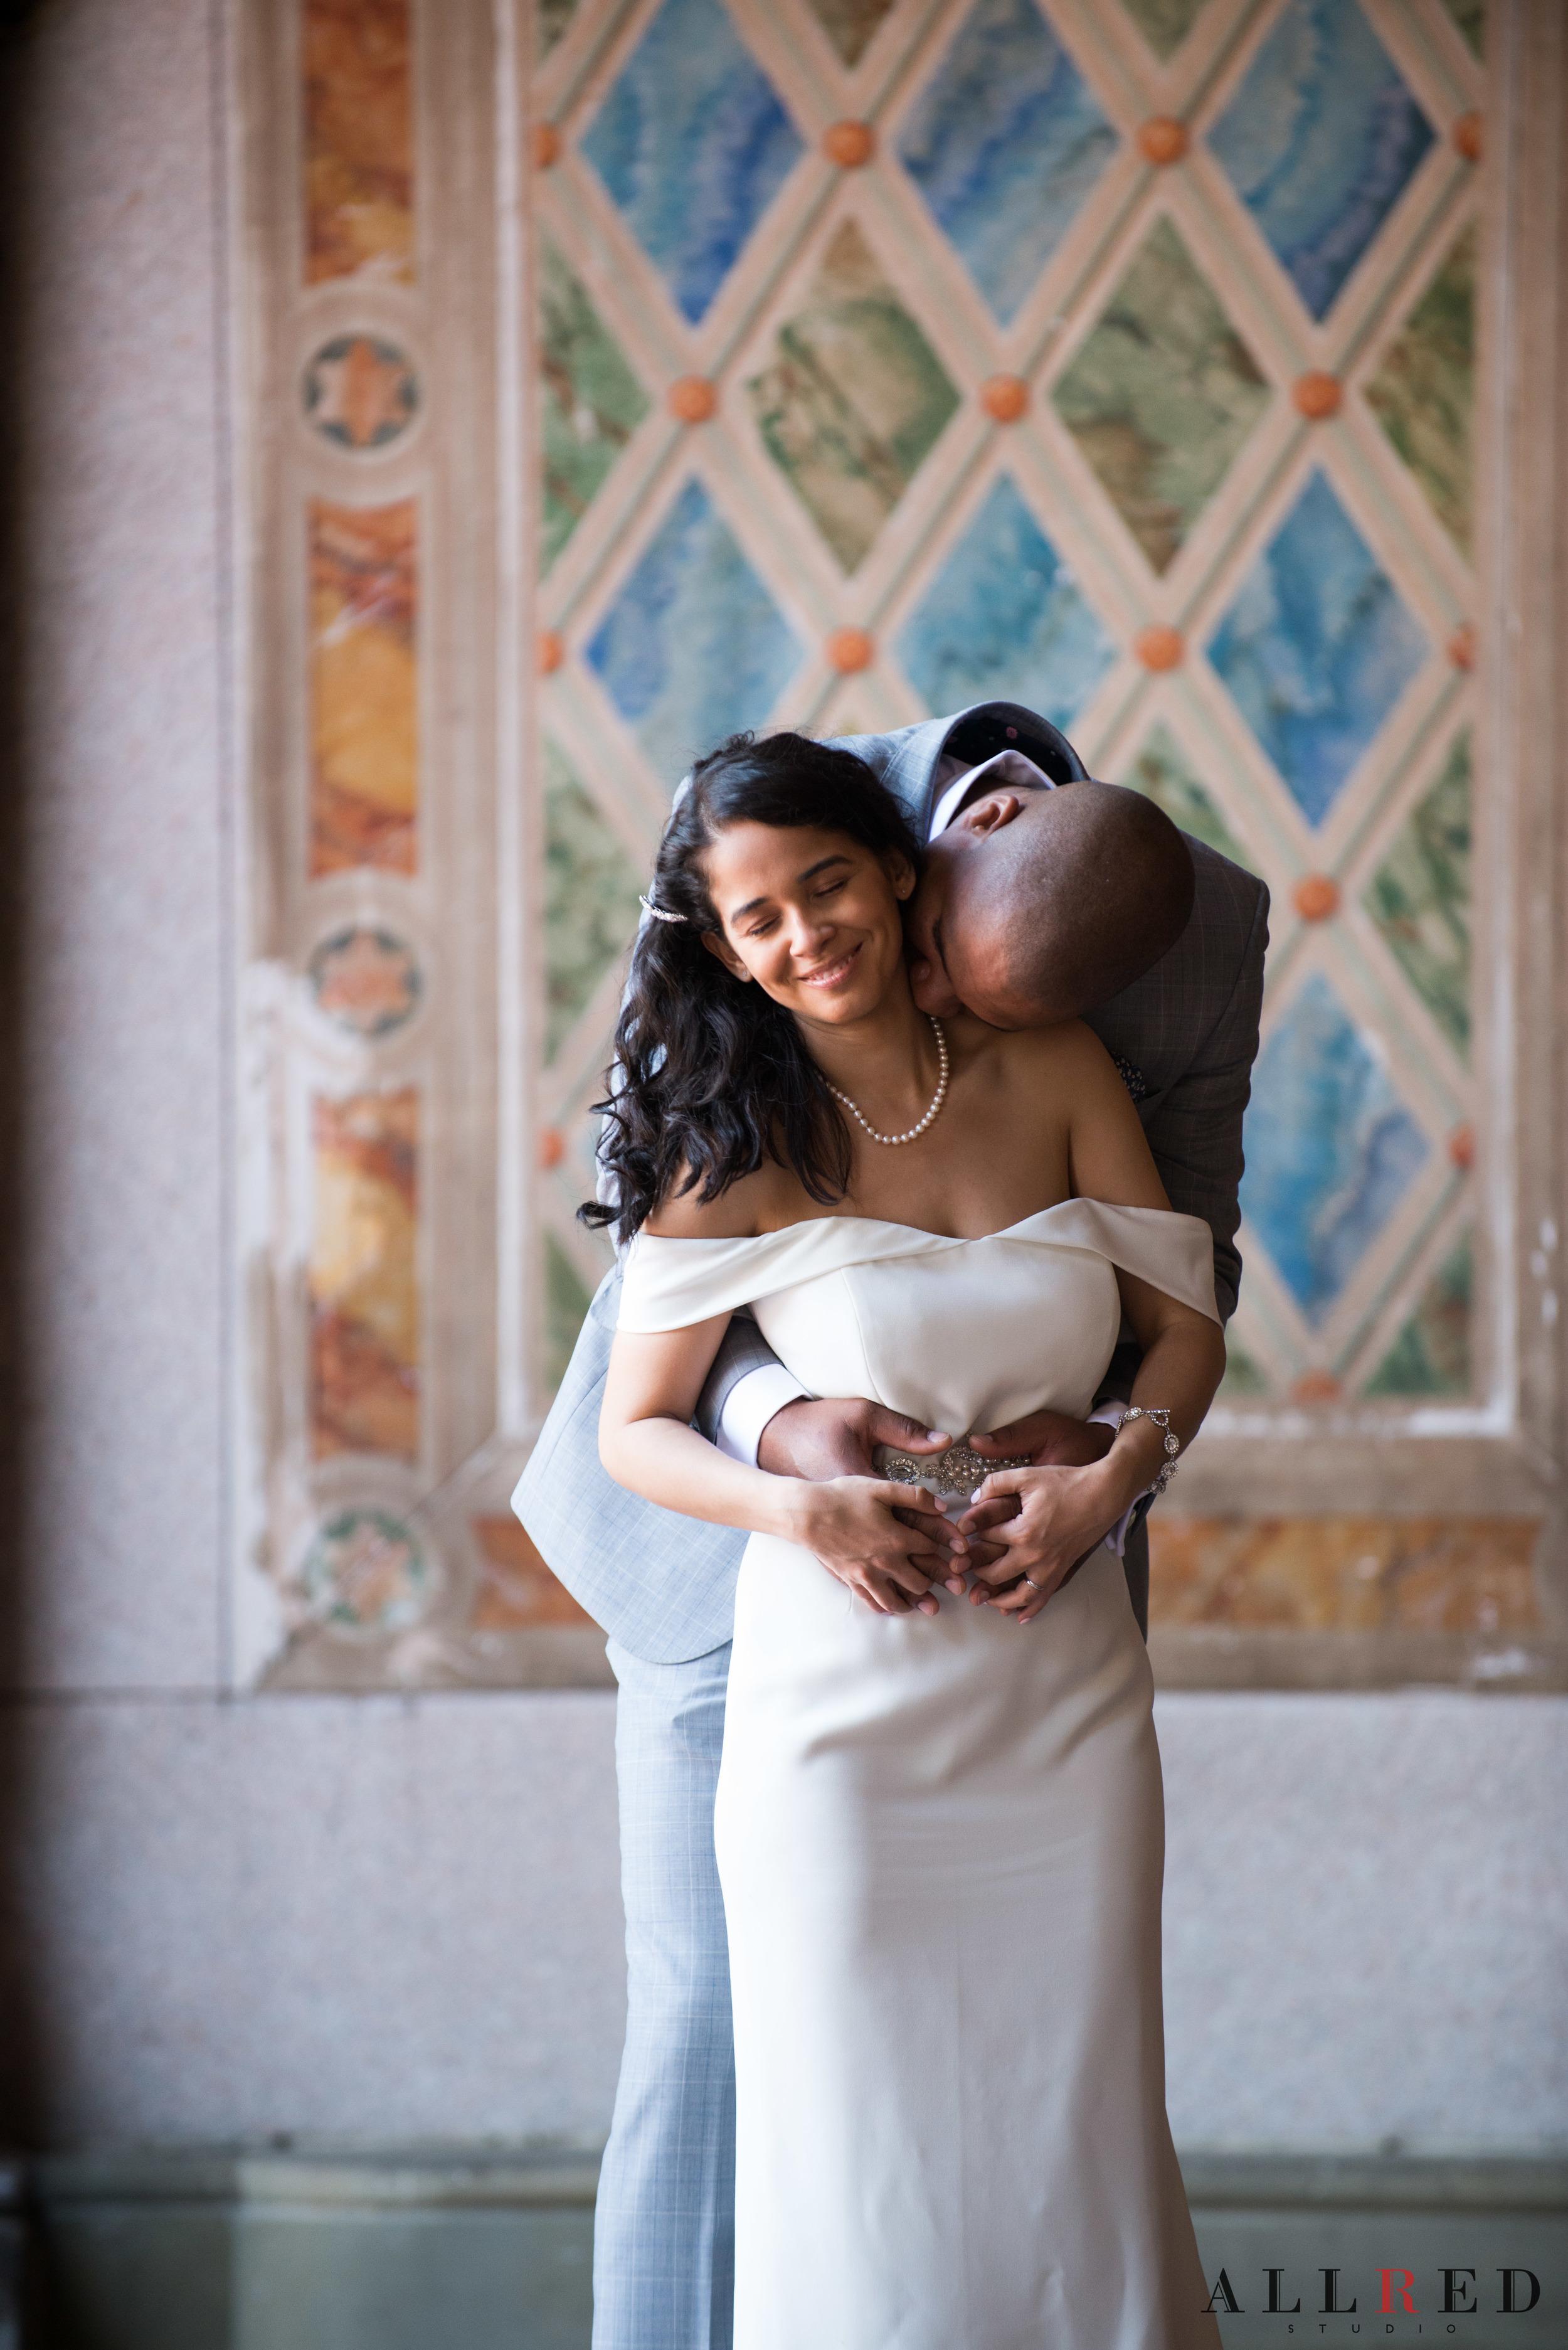 Wedding-central-park-allred-studio-new-york-photographer-new-jersey-hudson-valley-2627.jpg